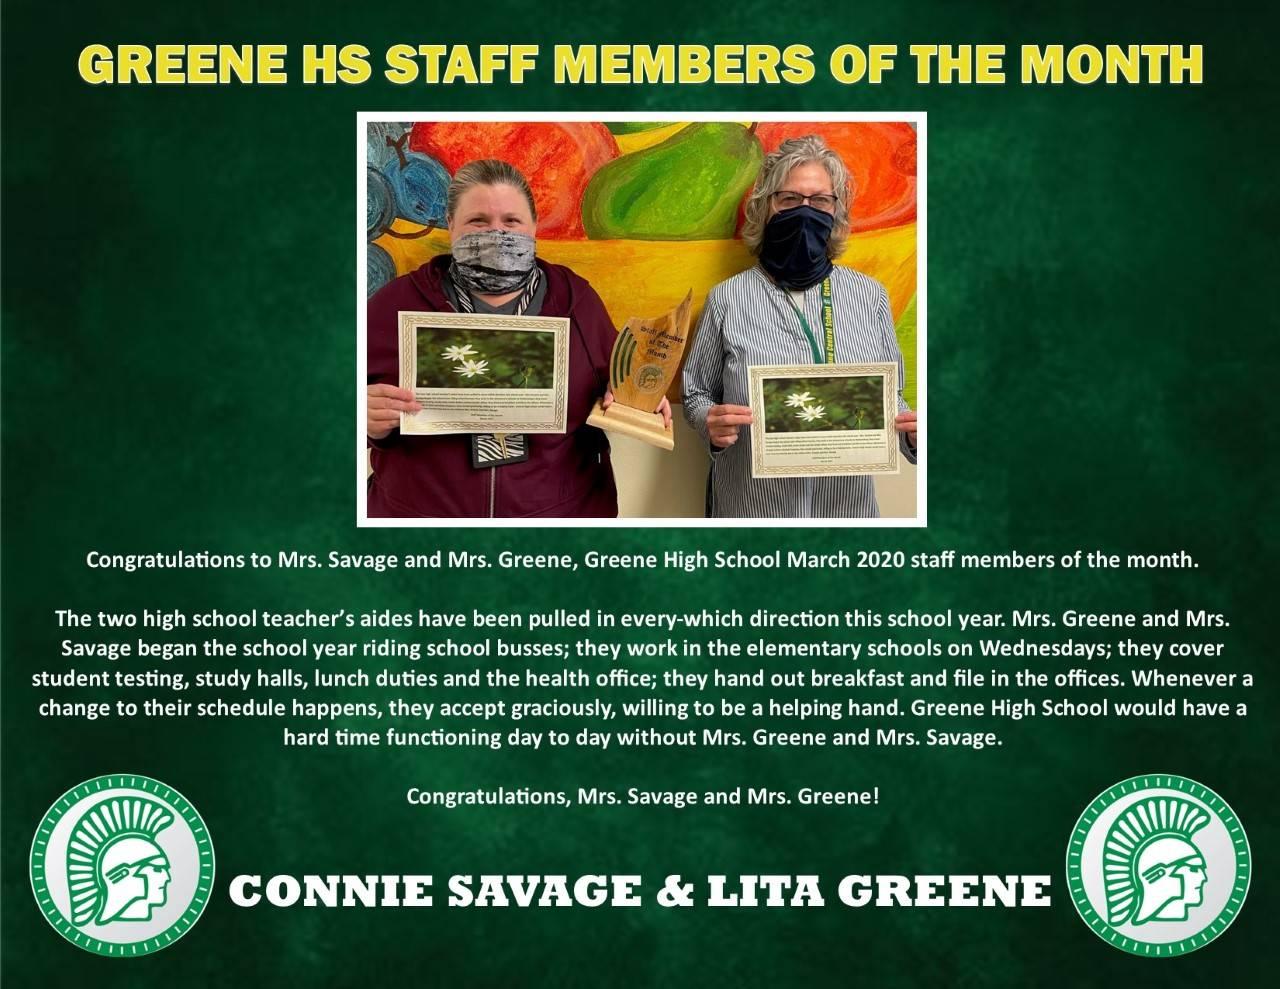 Mrs. Savage and Mrs. Greene's Staff member of Month Bio page